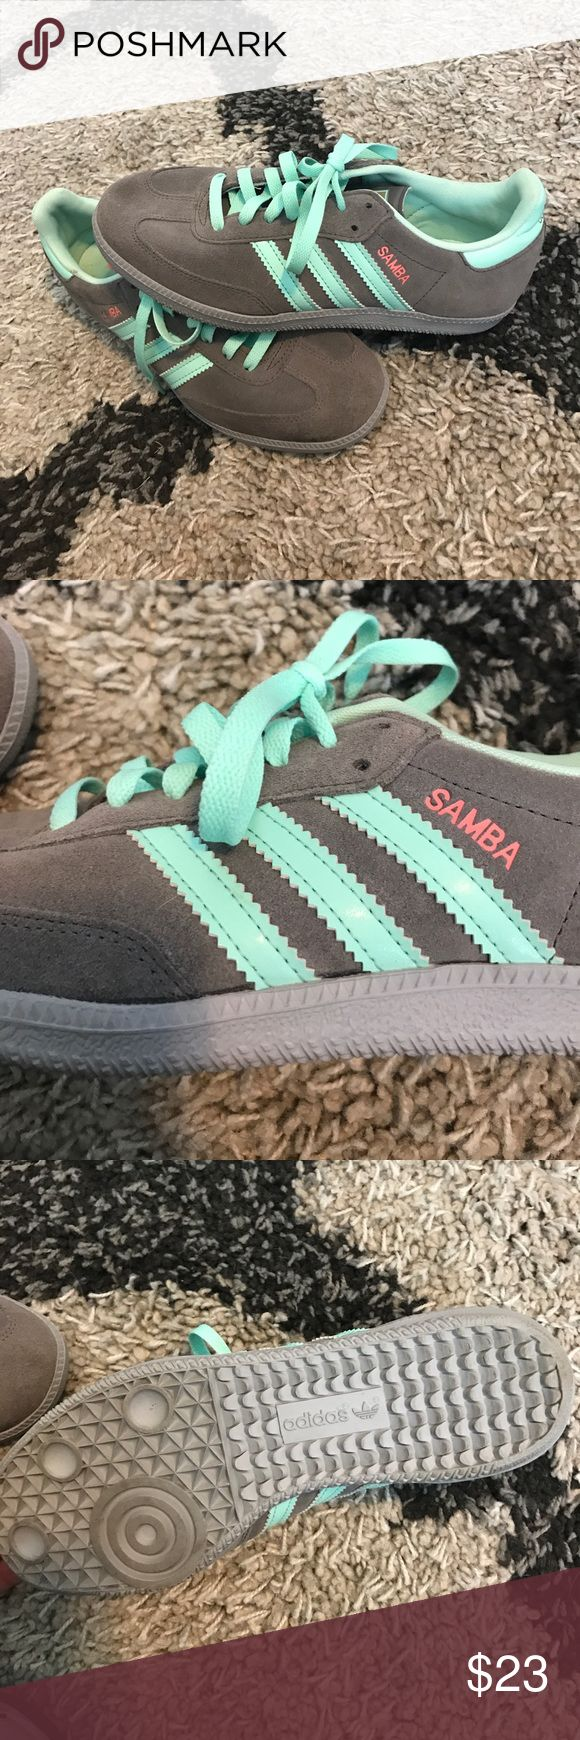 Women's Adidas Samba Shoes (size 7.5) Women's Adidas Samba Shoes (size 7.5)  new condition Adidas Shoes Athletic Shoes